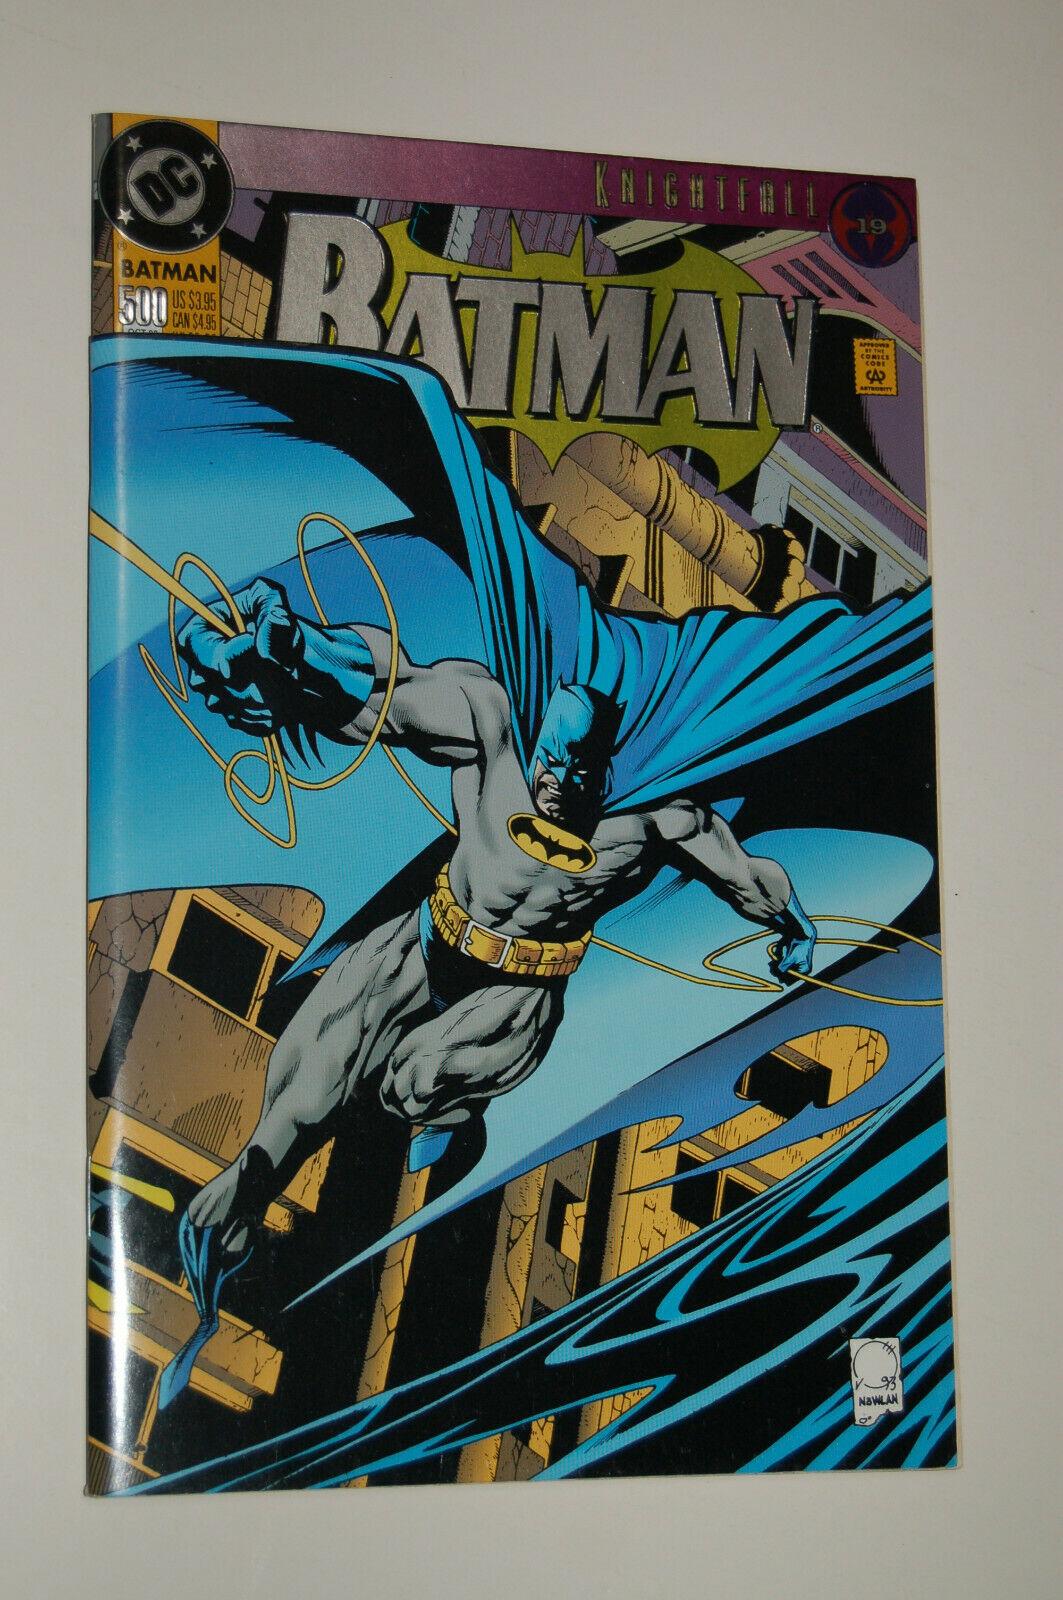 Batman 15 Knightfall 15 Bane w/postcard VF NM Collectible ...